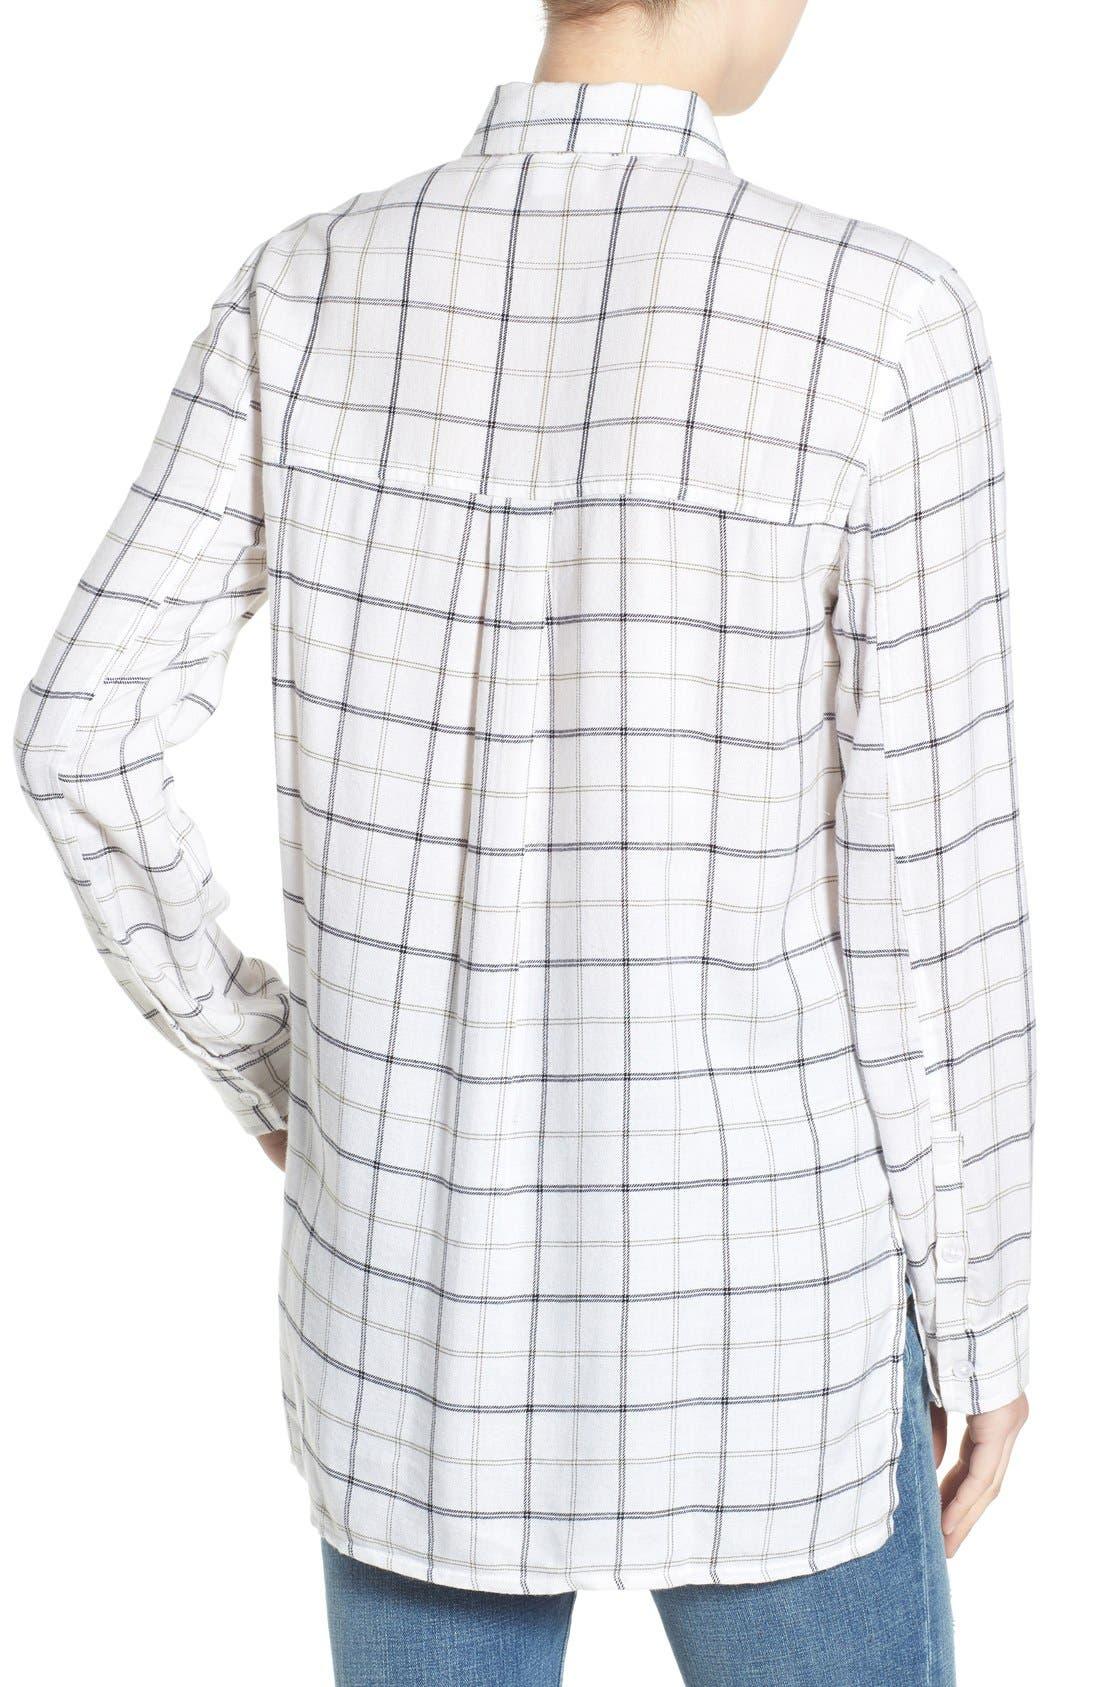 Alternate Image 2  - BP. Plaid Tunic Shirt